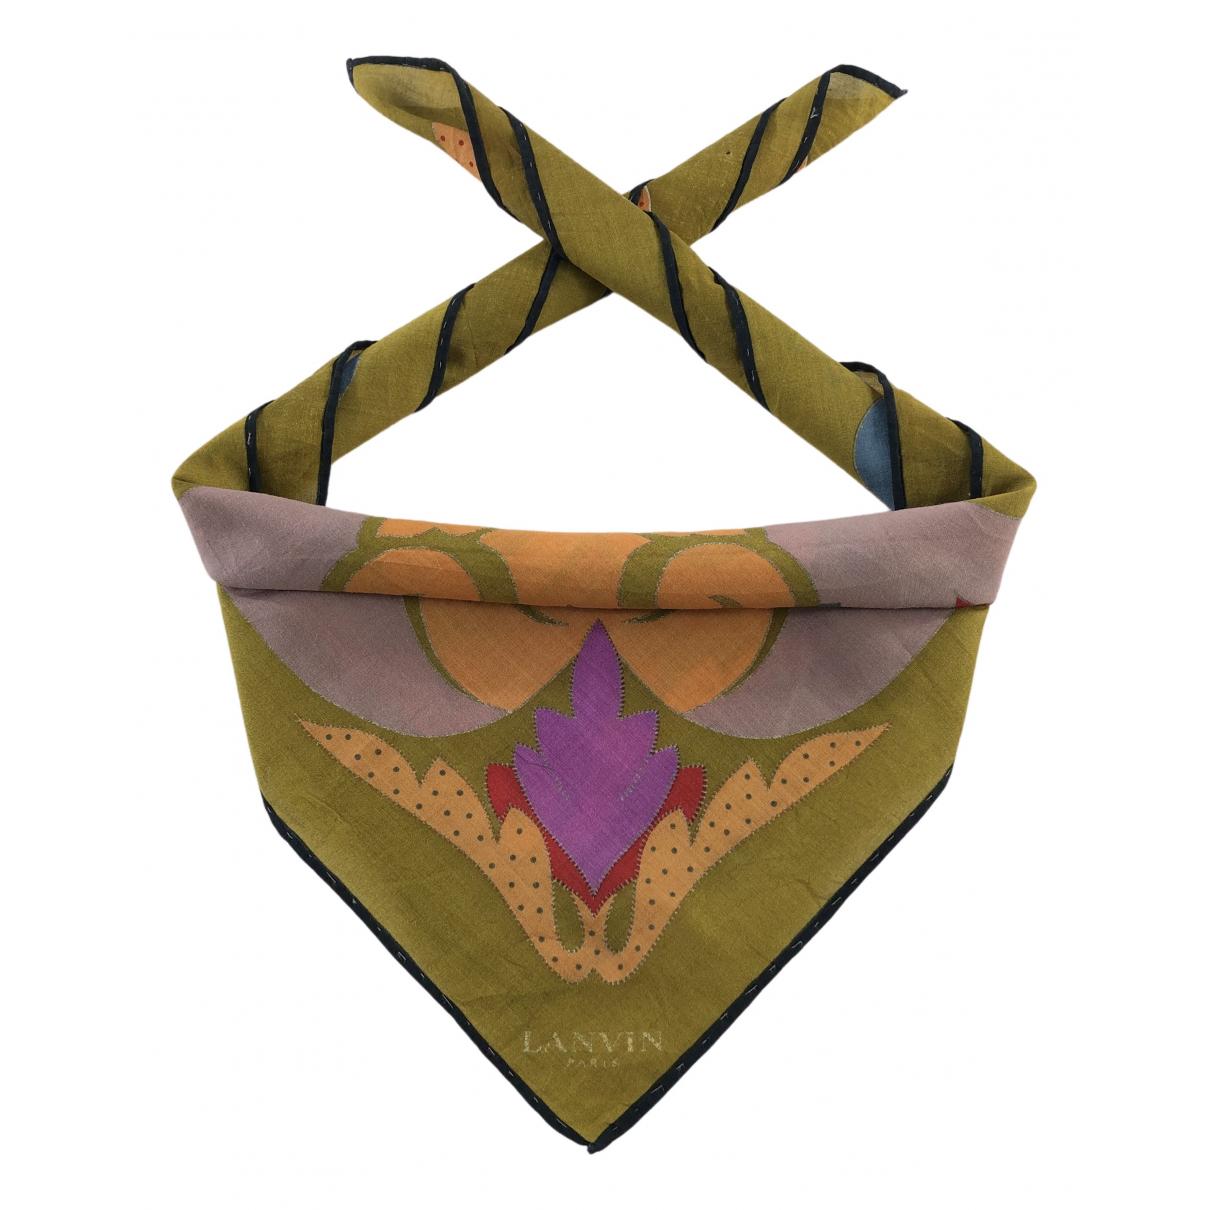 Lanvin N Multicolour Cotton Silk handkerchief for Women N